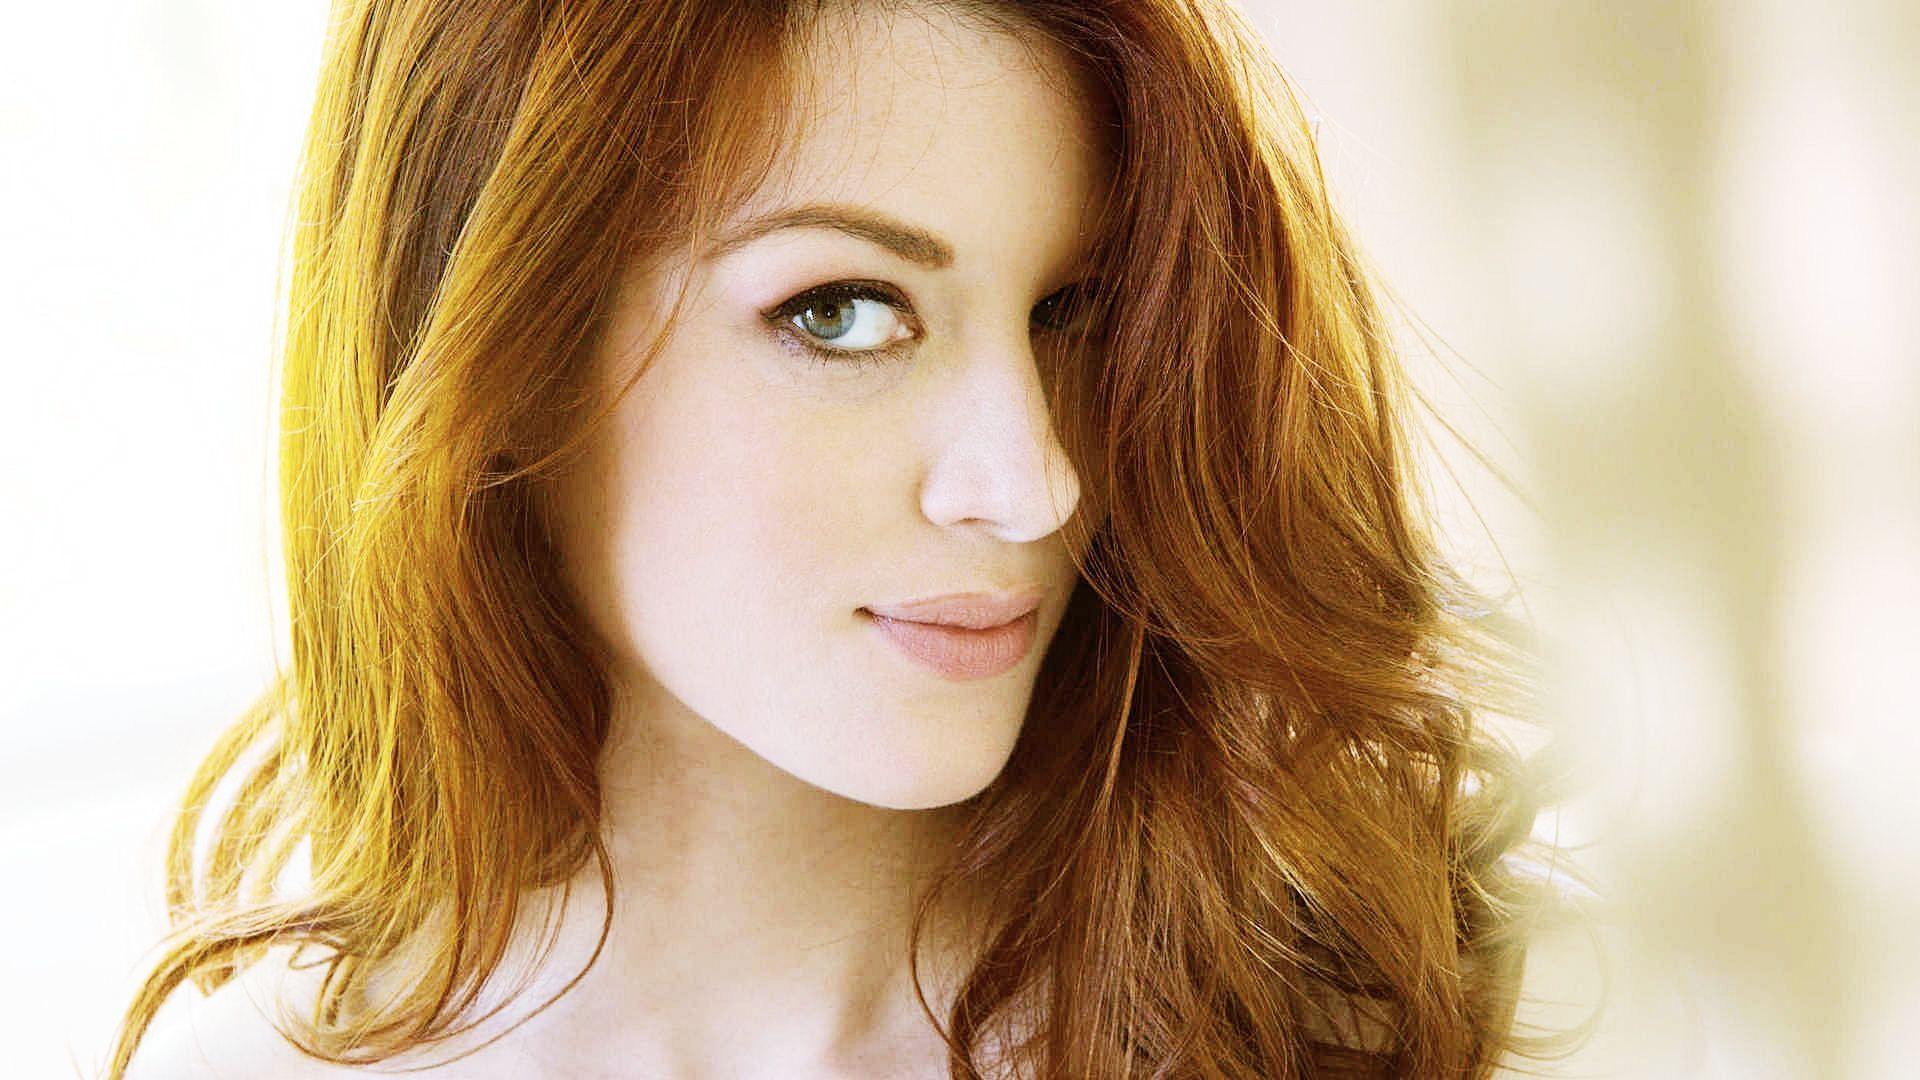 Most Beautiful Women Wallpaper - Most Beautiful Girl In The World , HD Wallpaper & Backgrounds